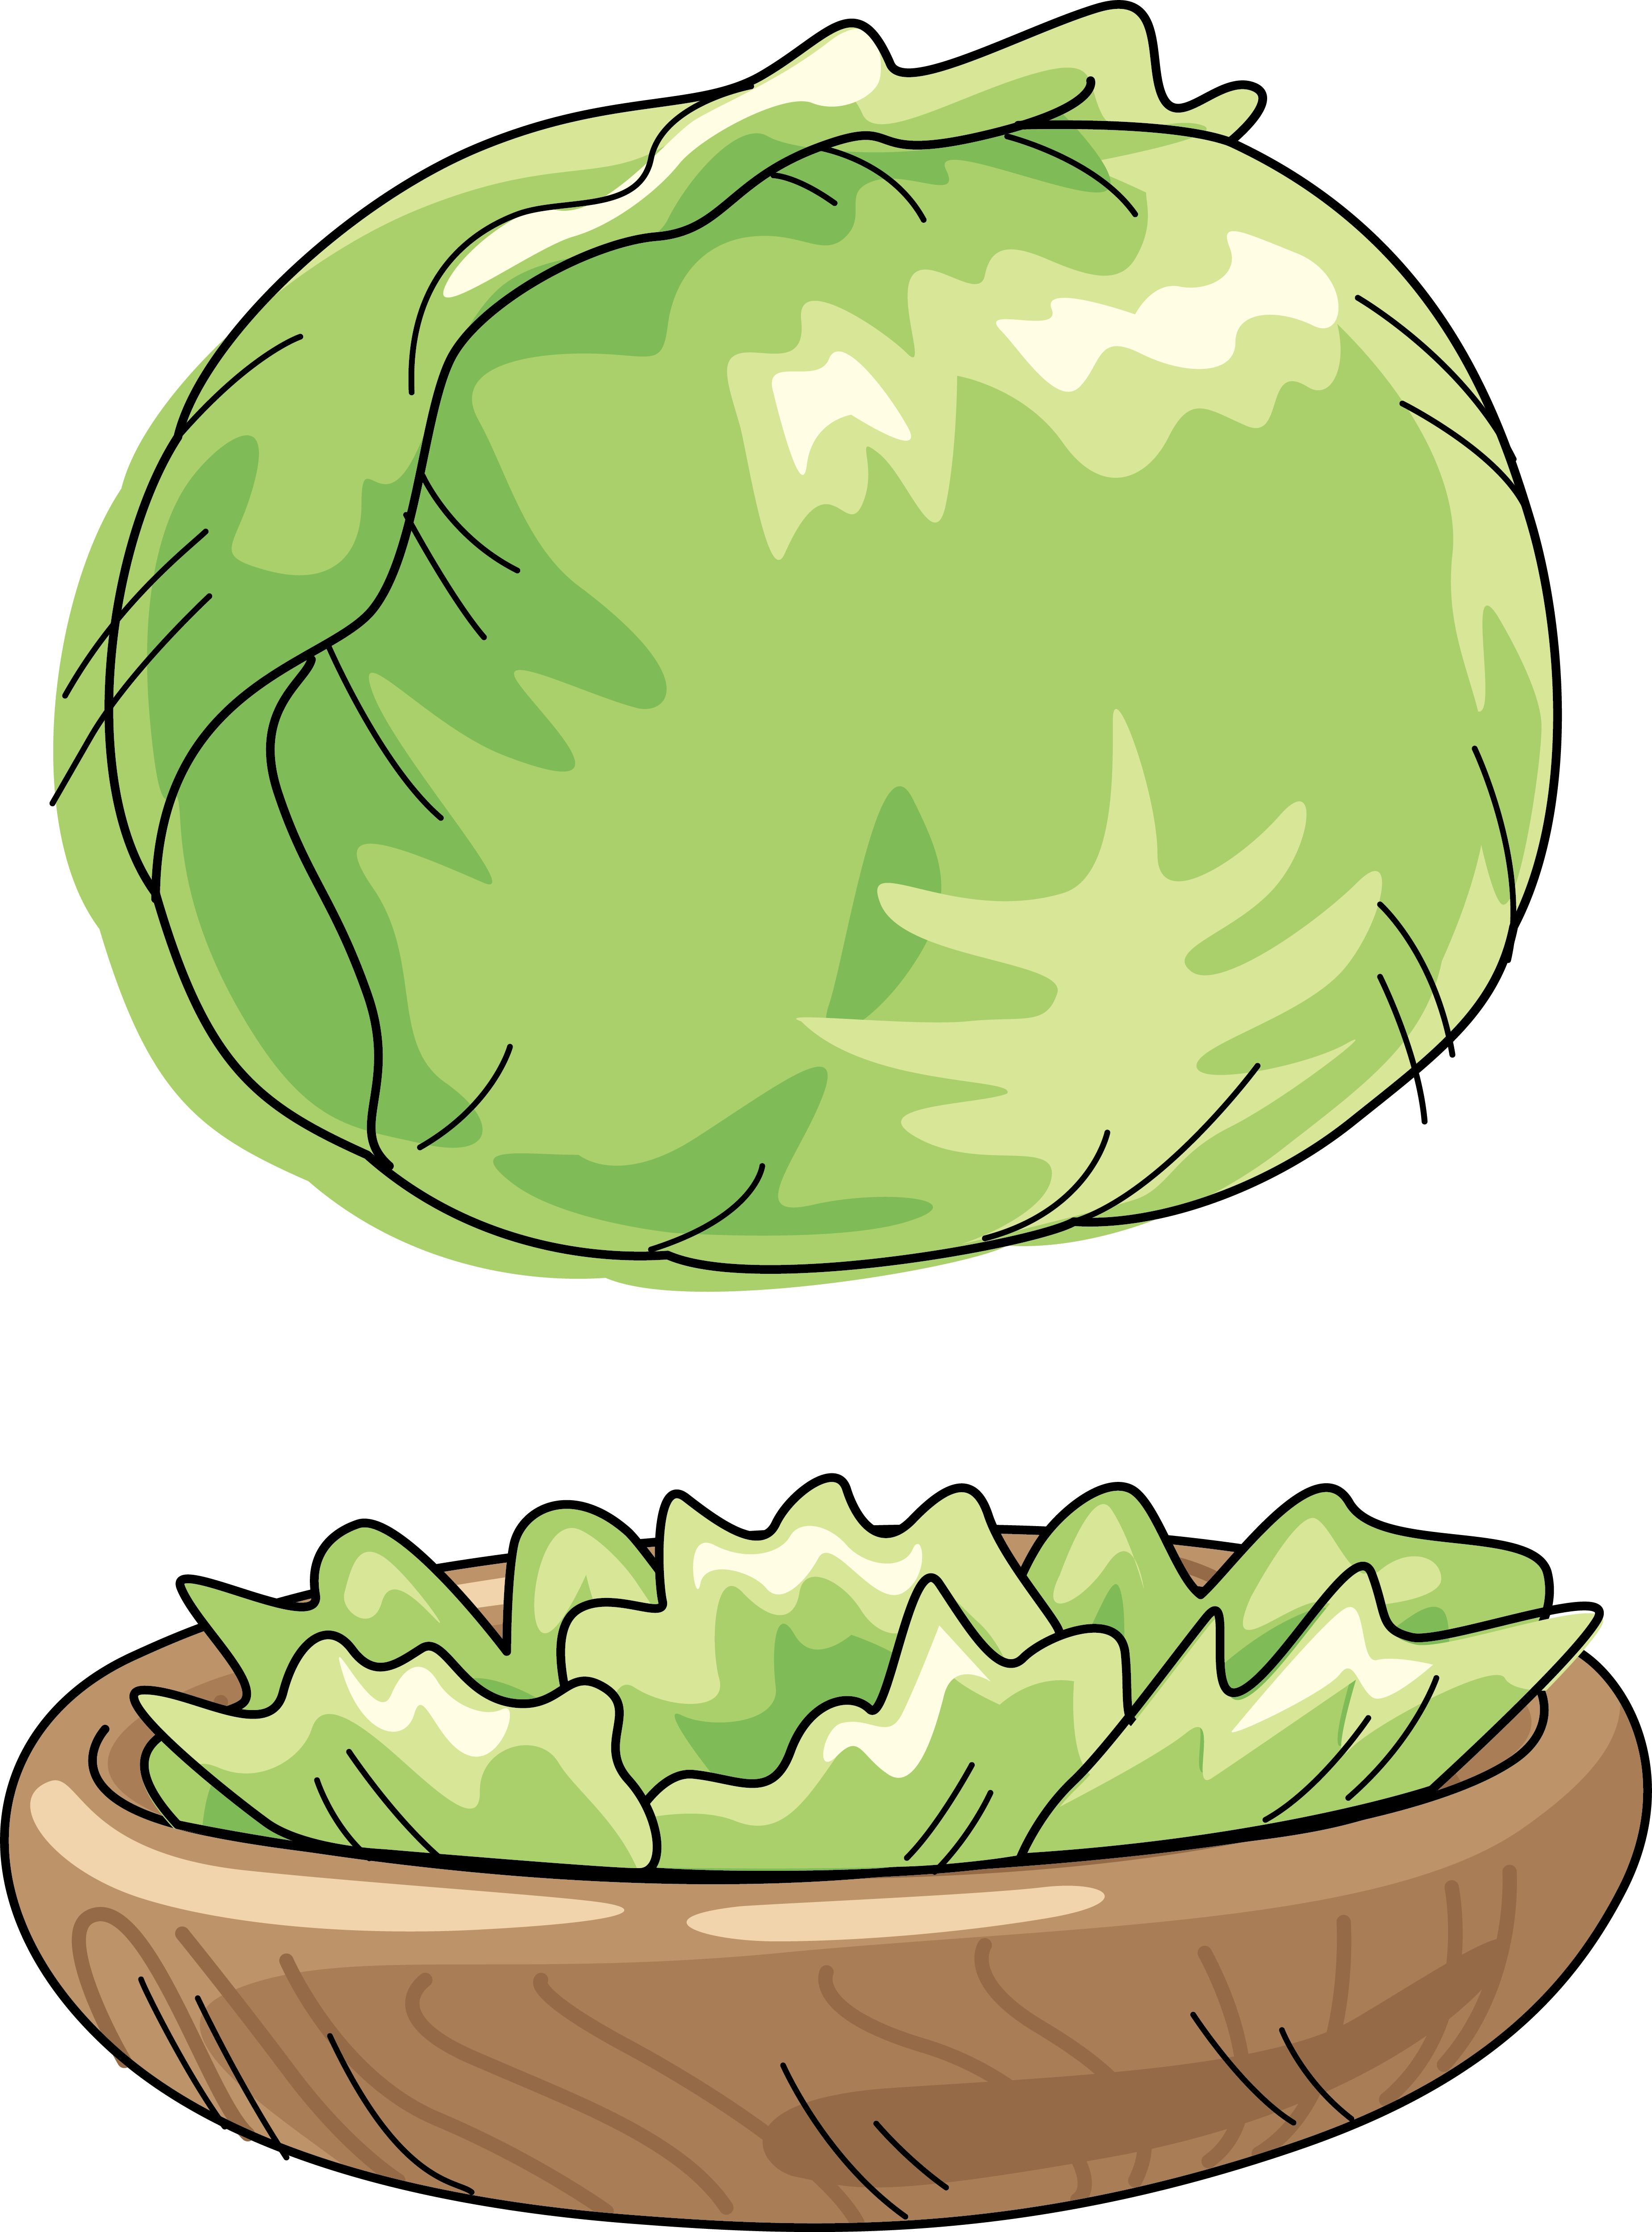 Cabbage cartoon clip art. Watermelon clipart green fruit vegetable